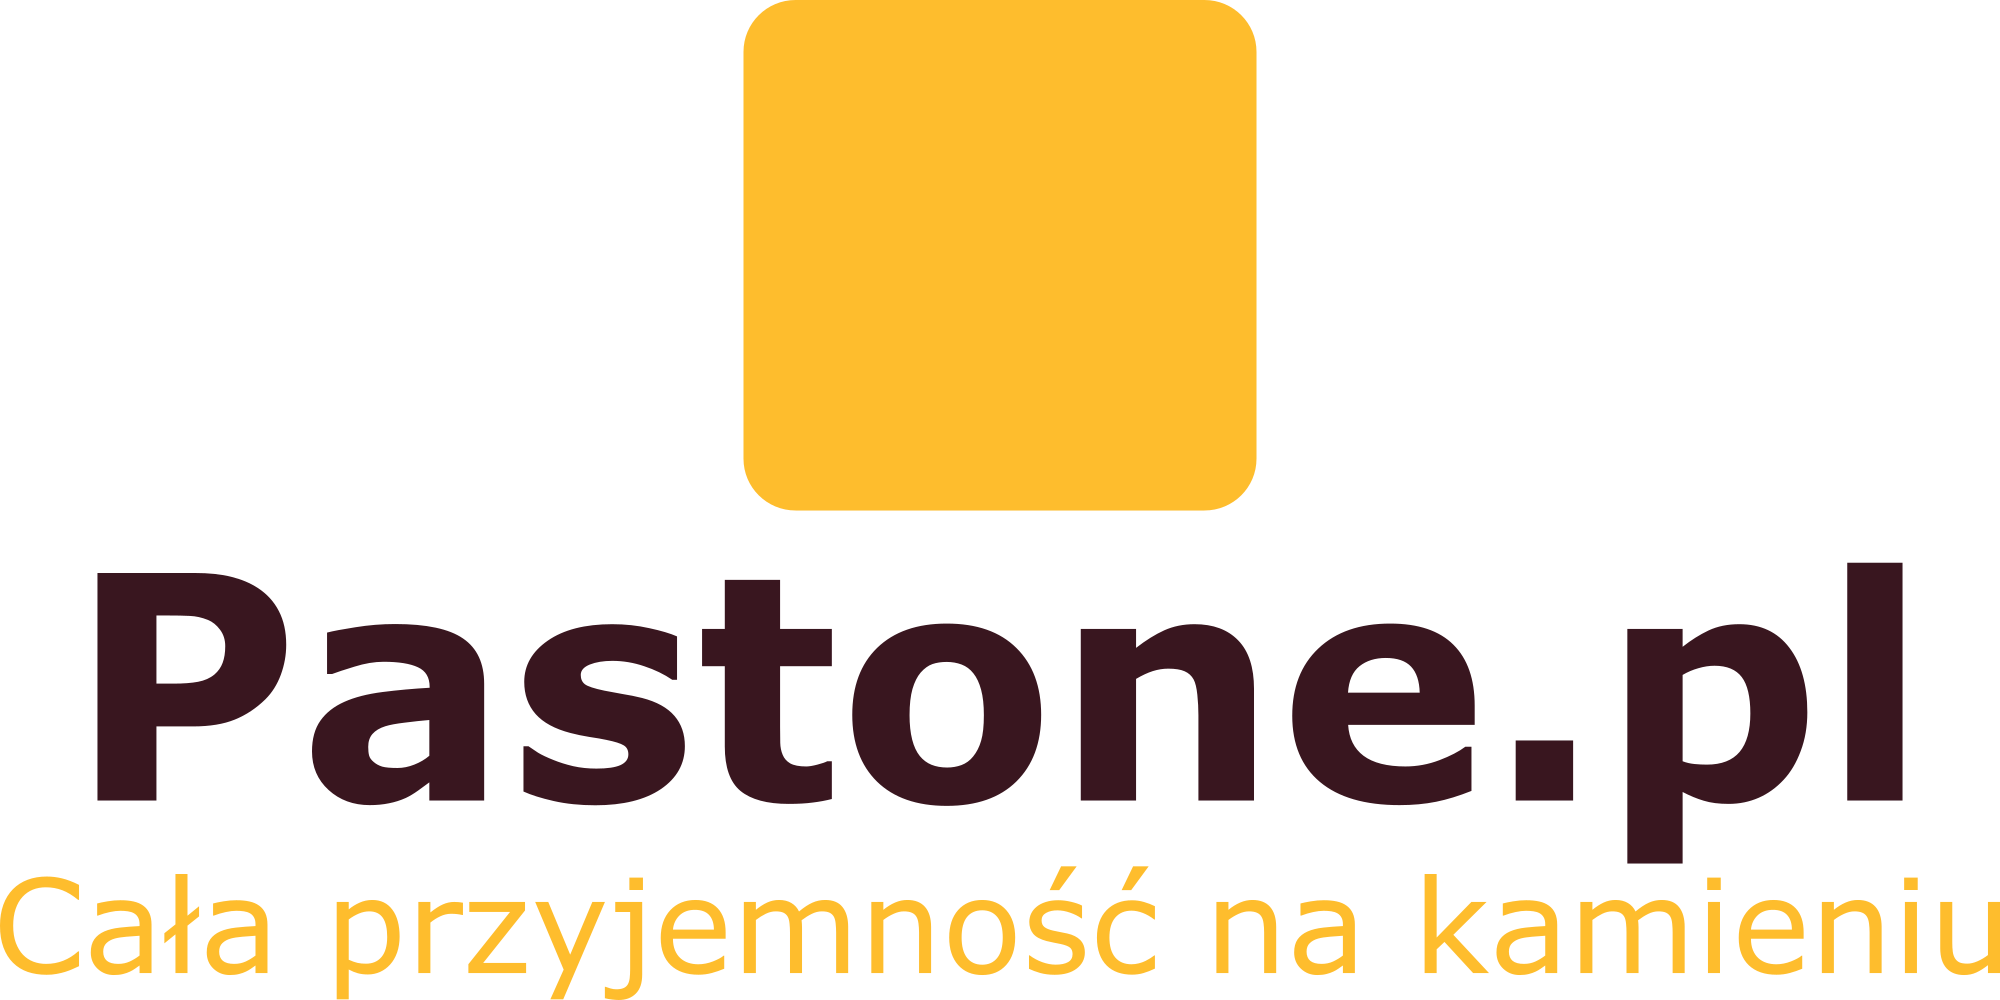 Postone.pl